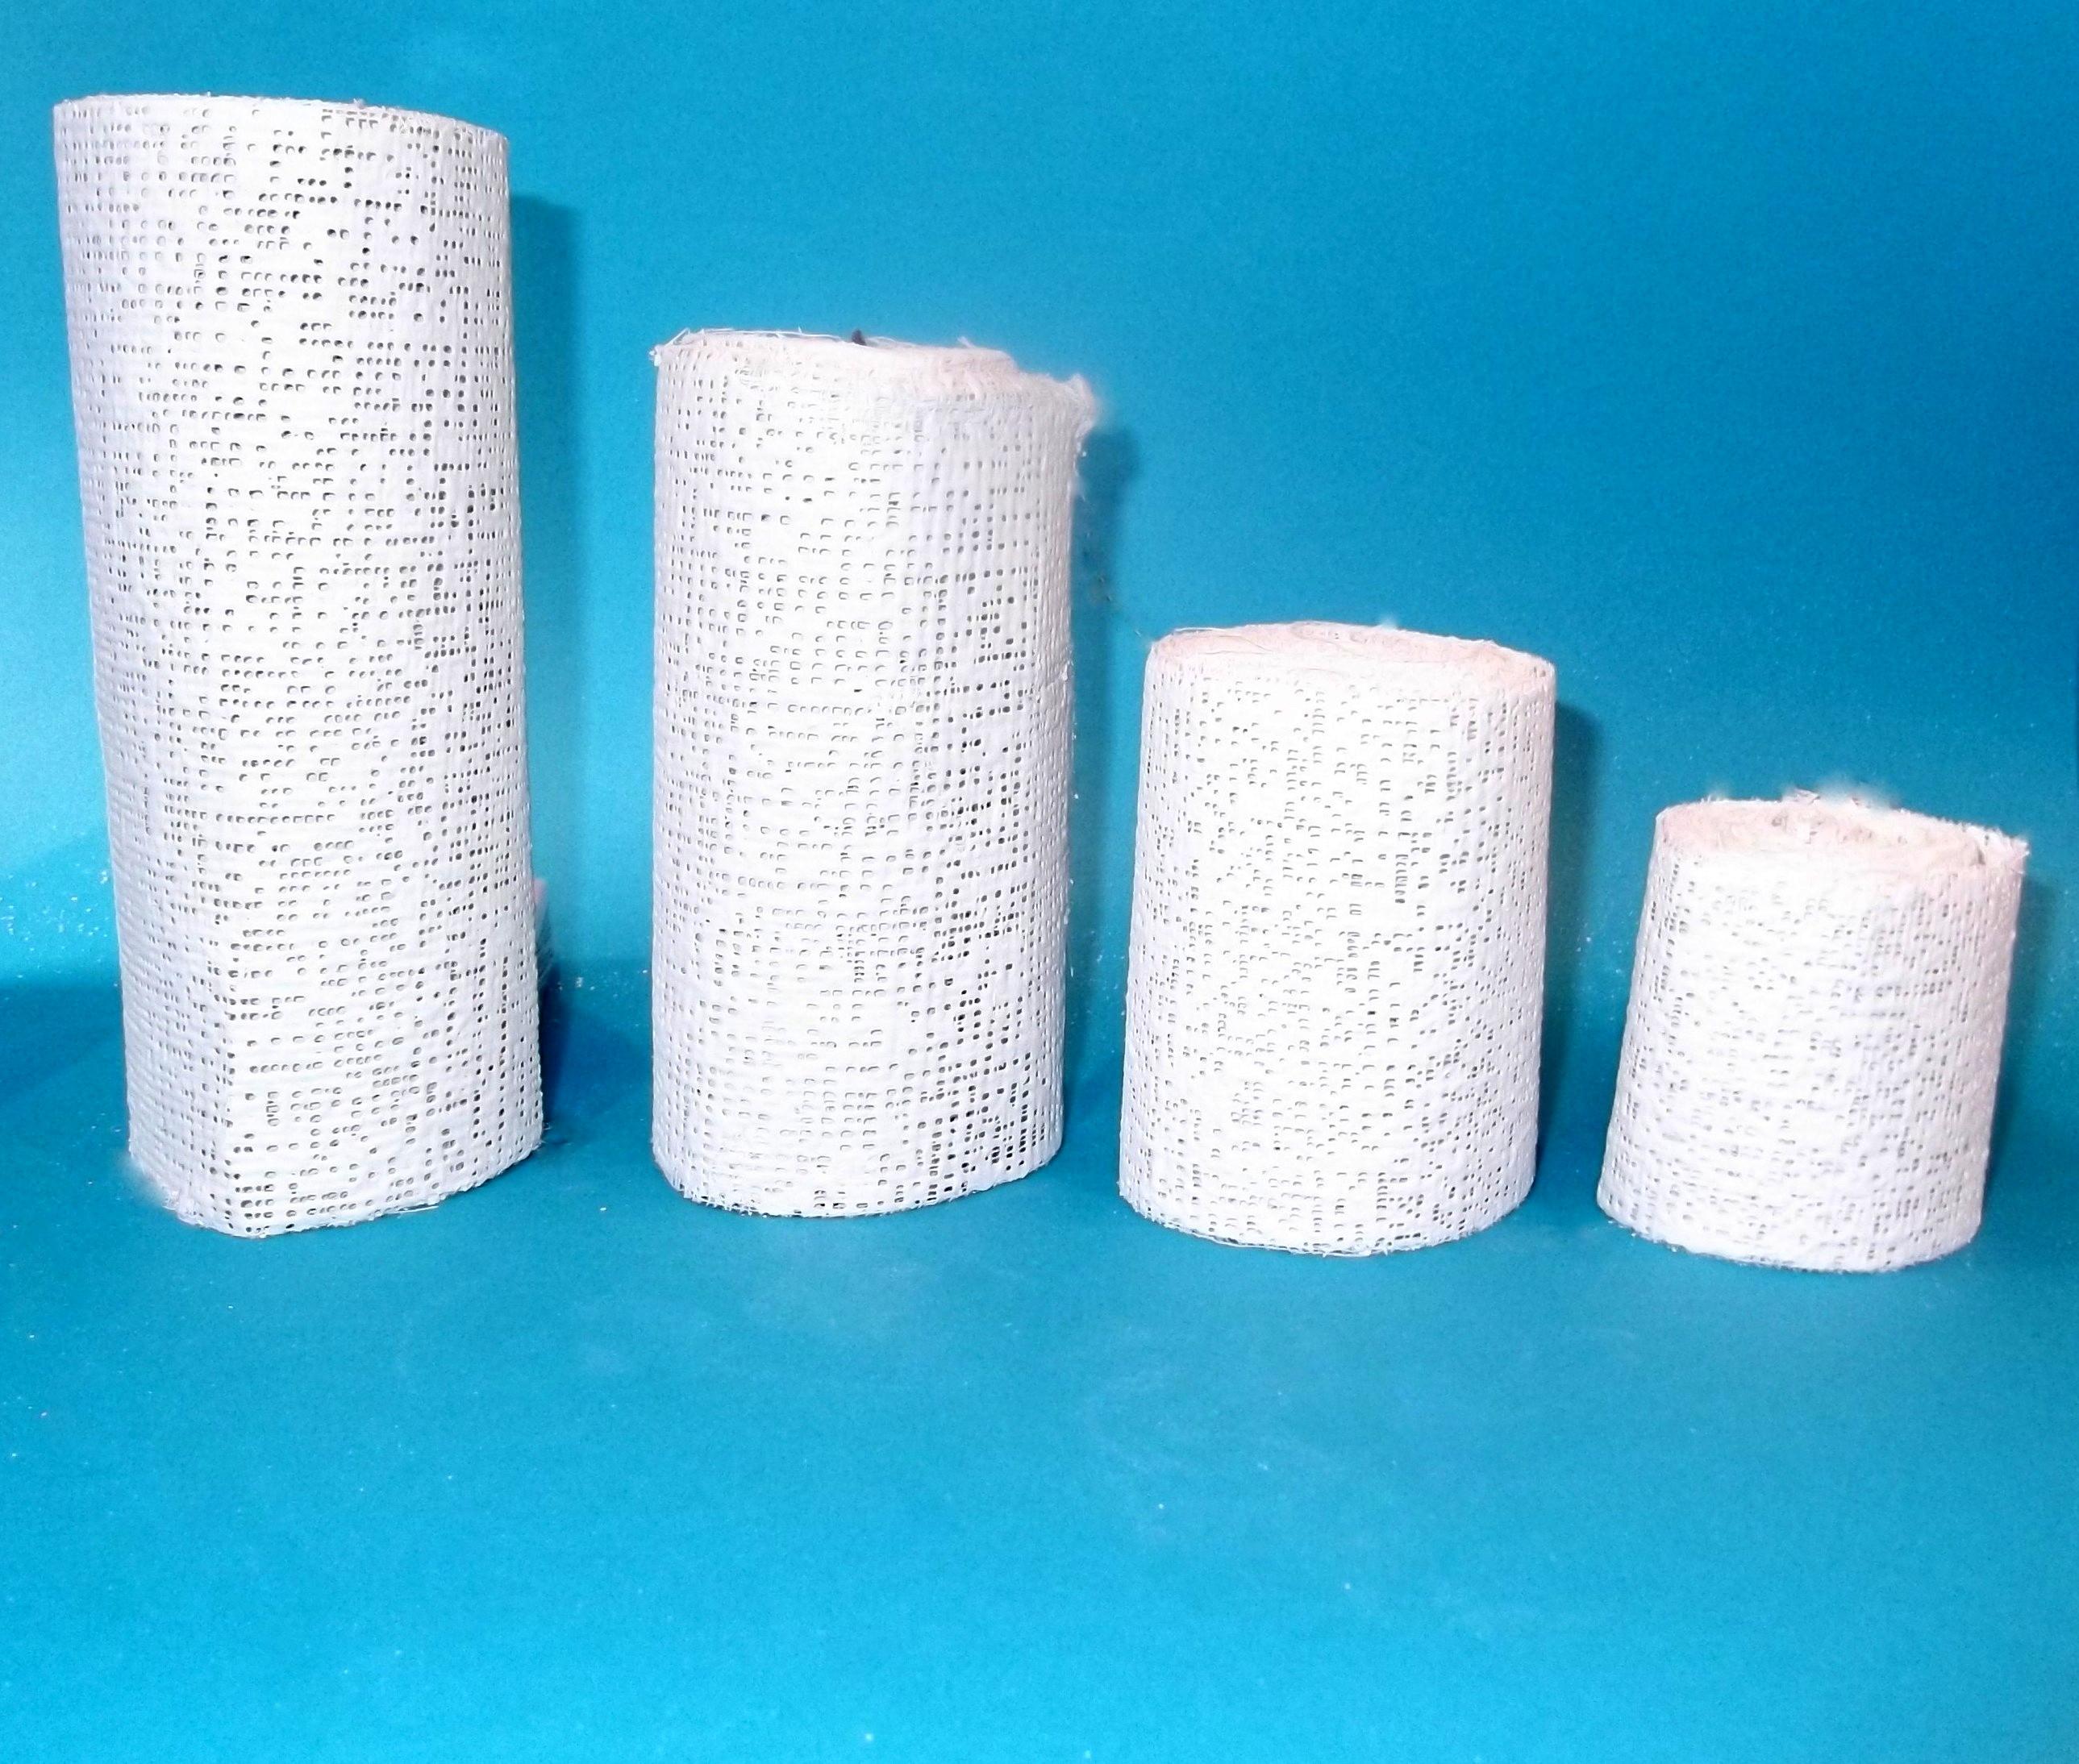 casting plaster of paris alginate modroc craftmill. Black Bedroom Furniture Sets. Home Design Ideas